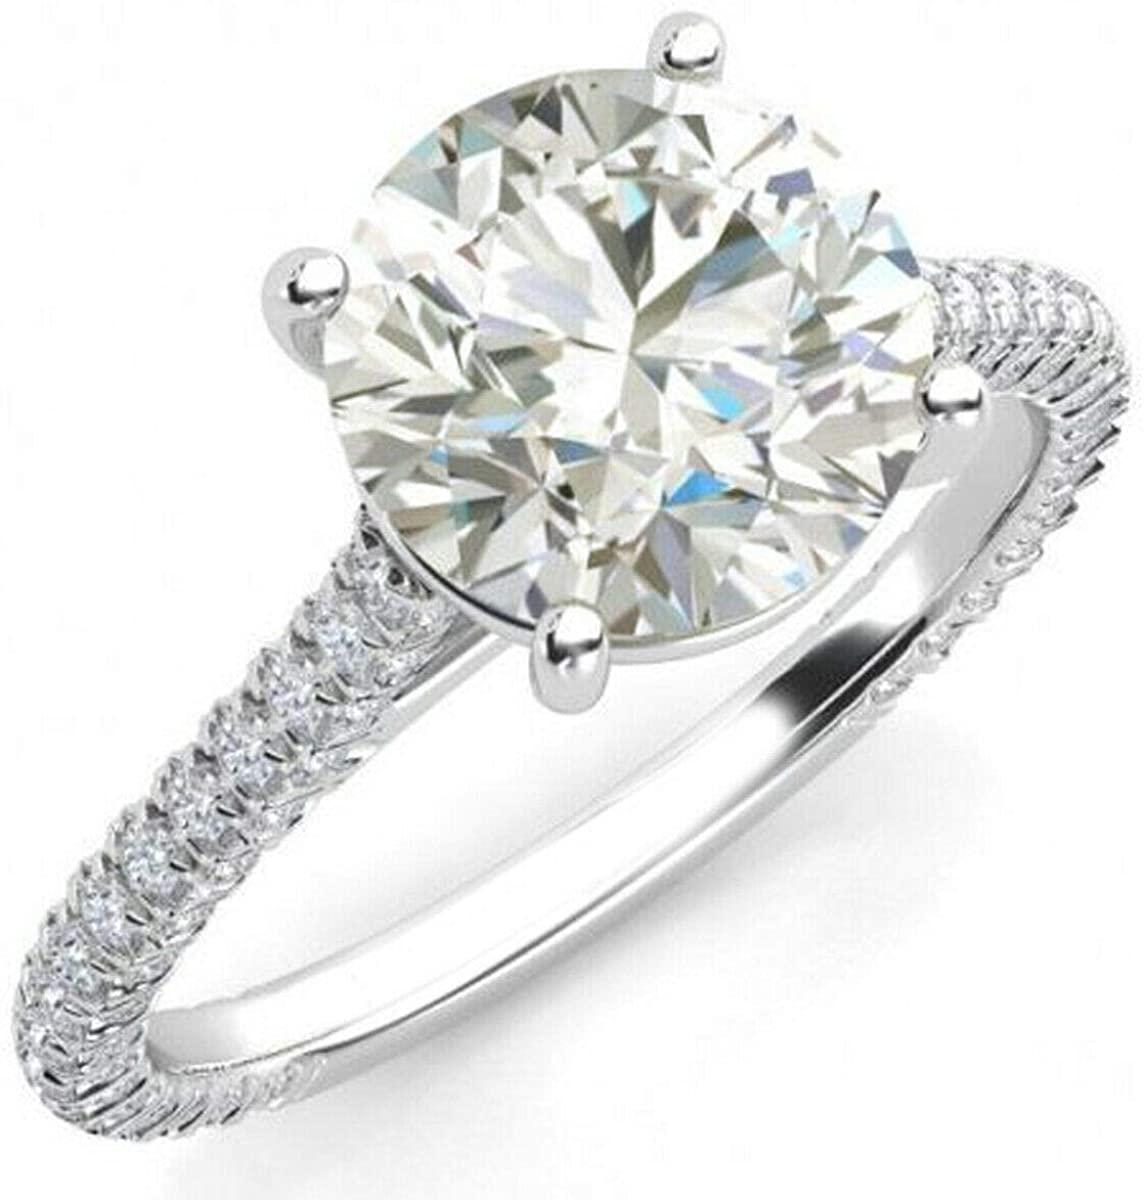 RINGJEWEL Round Cut Near White Moissanite Engagement Ring Size 7